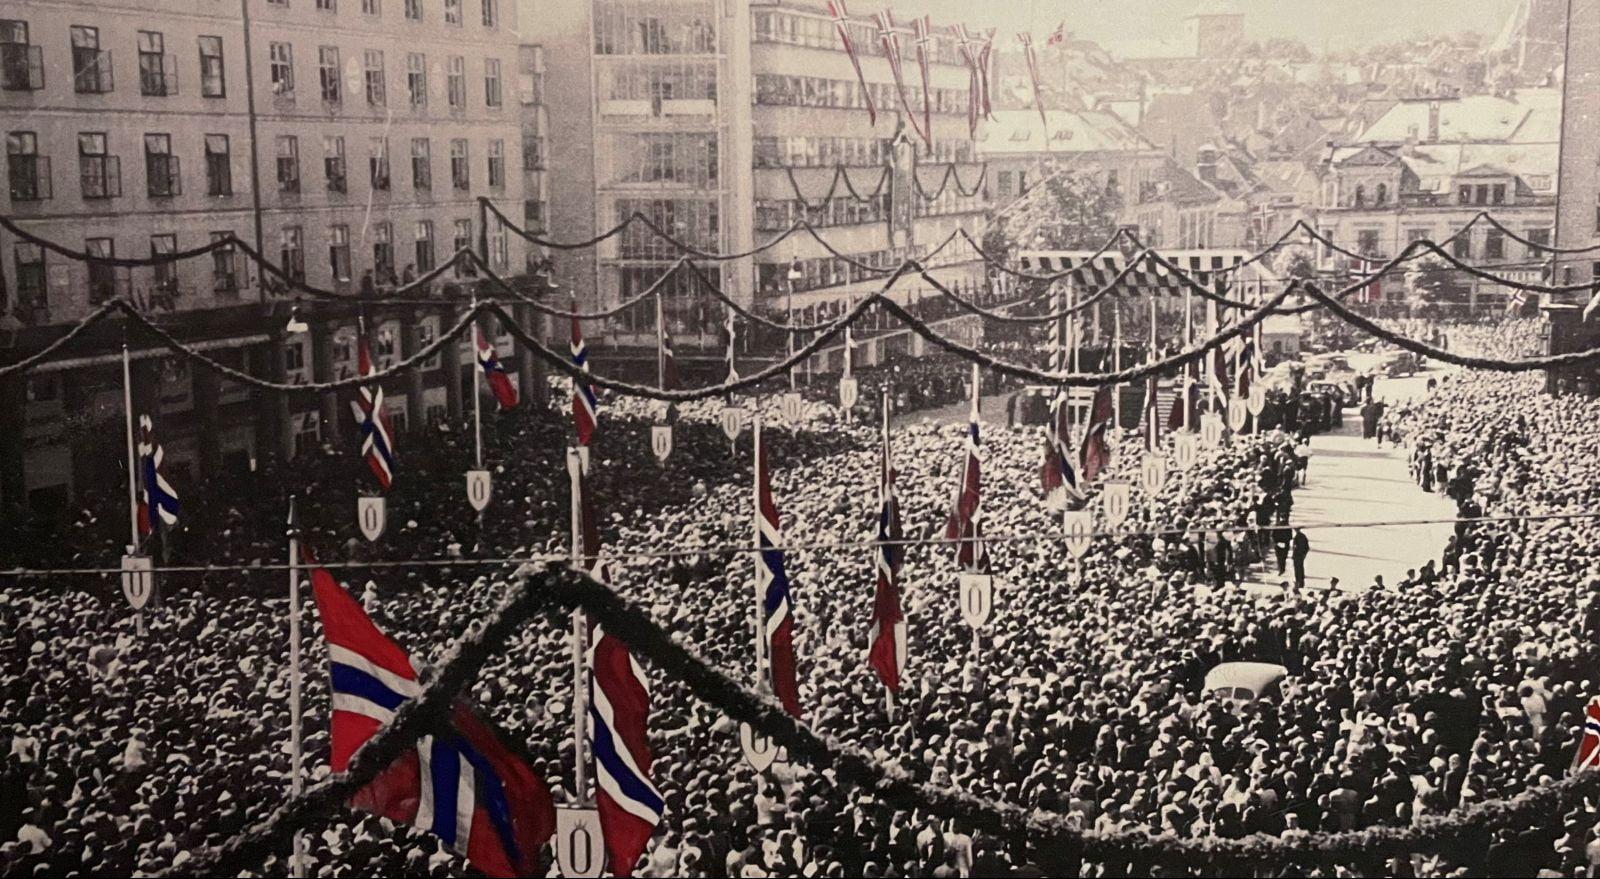 Bergen celebrates the end of war occupation